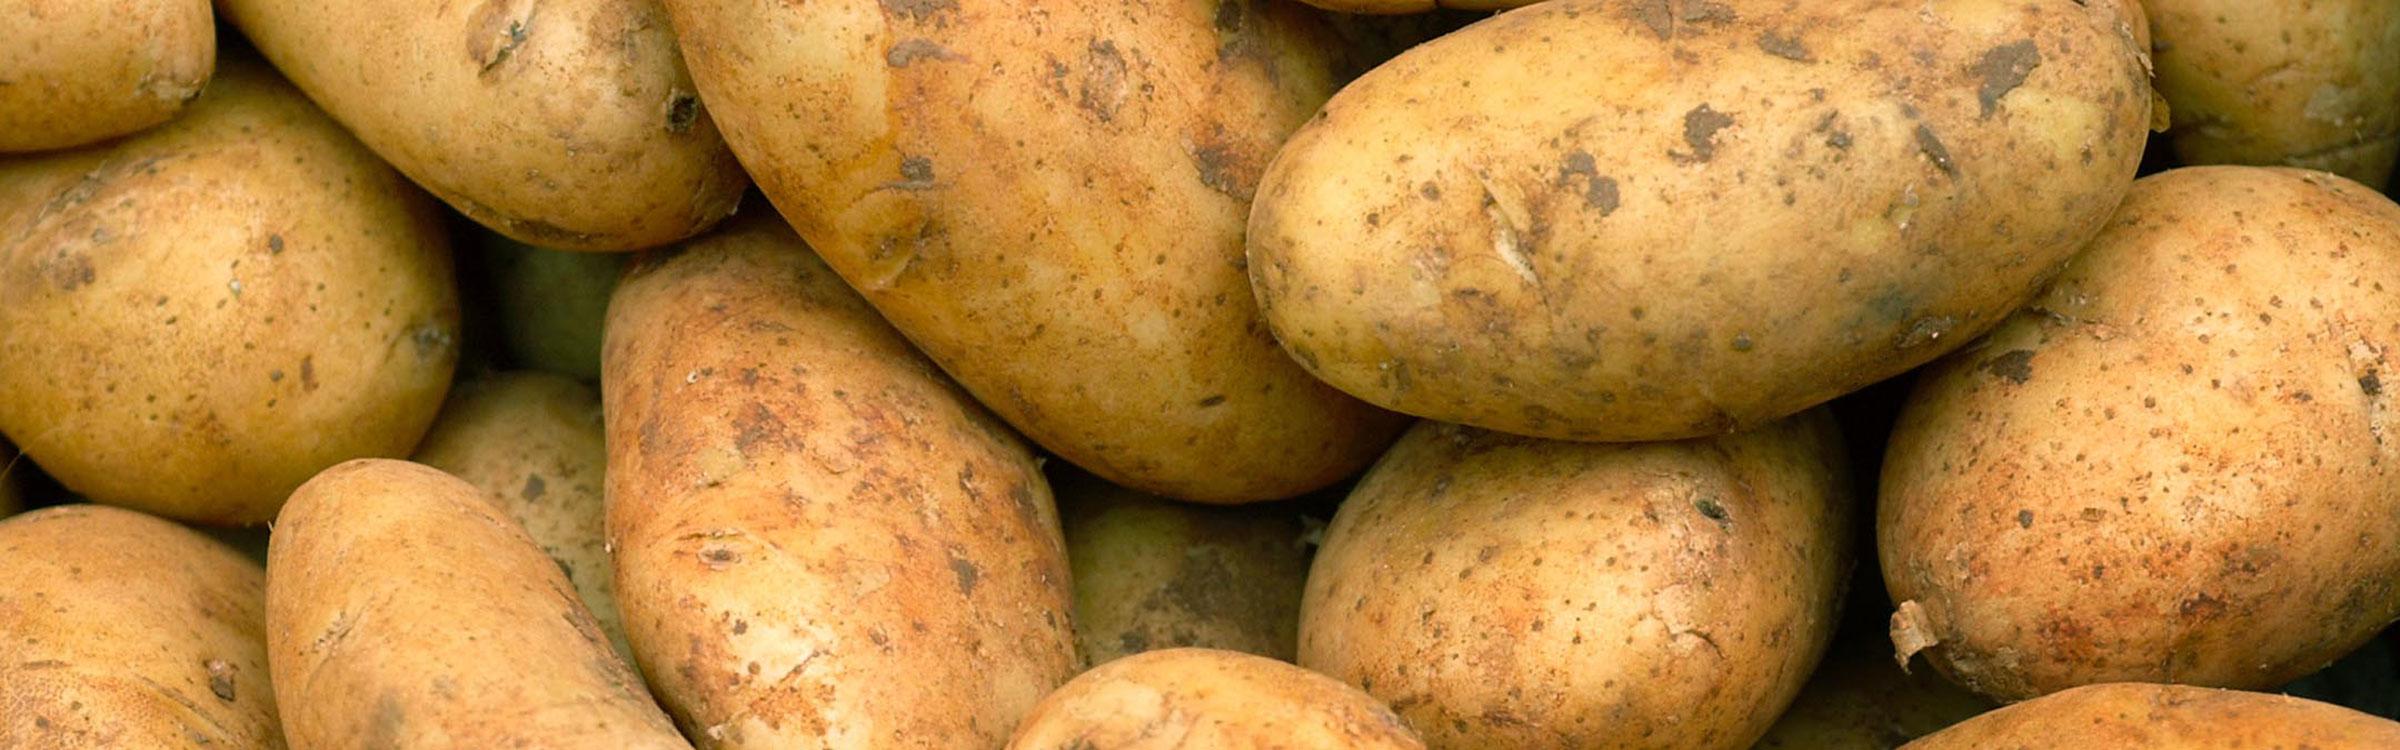 4 nl aardappel  1